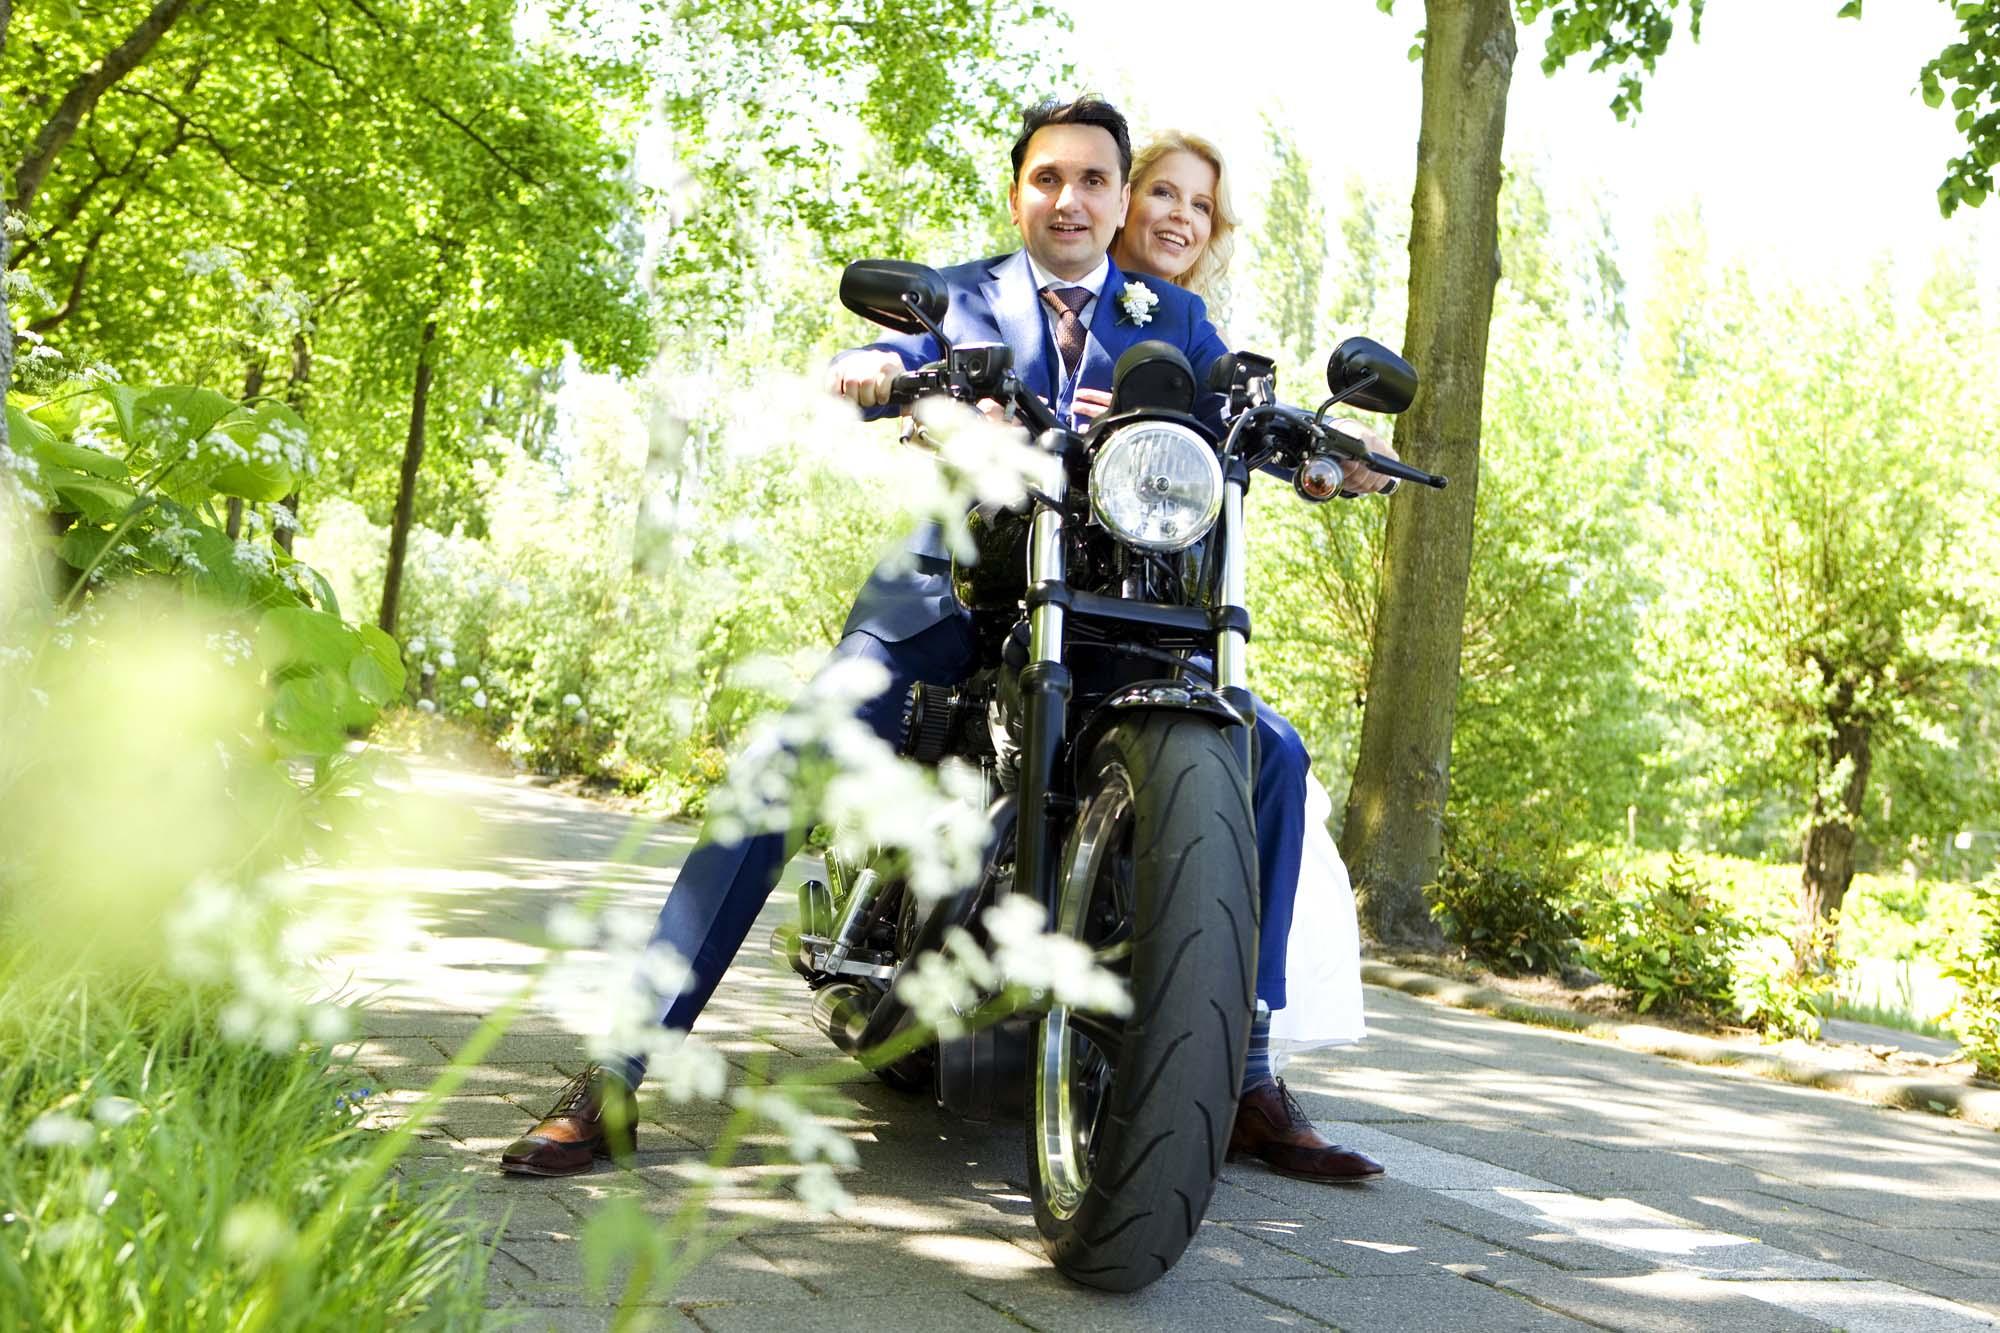 Bruidsfotografie bruiloft bruidspaar motor Harley Davidson trouwreportage Landgoed Te Werve Rijswijk